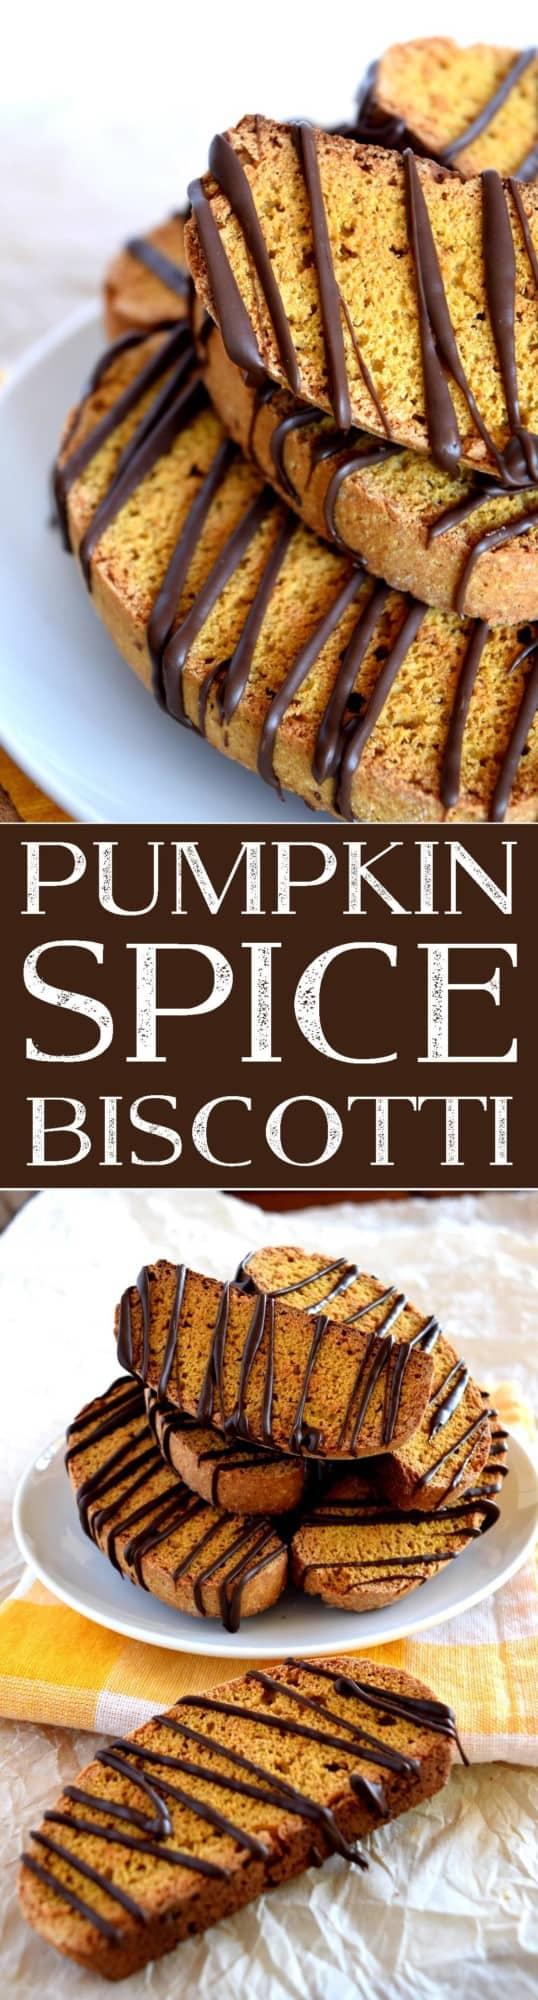 pumpkin-spice-biscotti